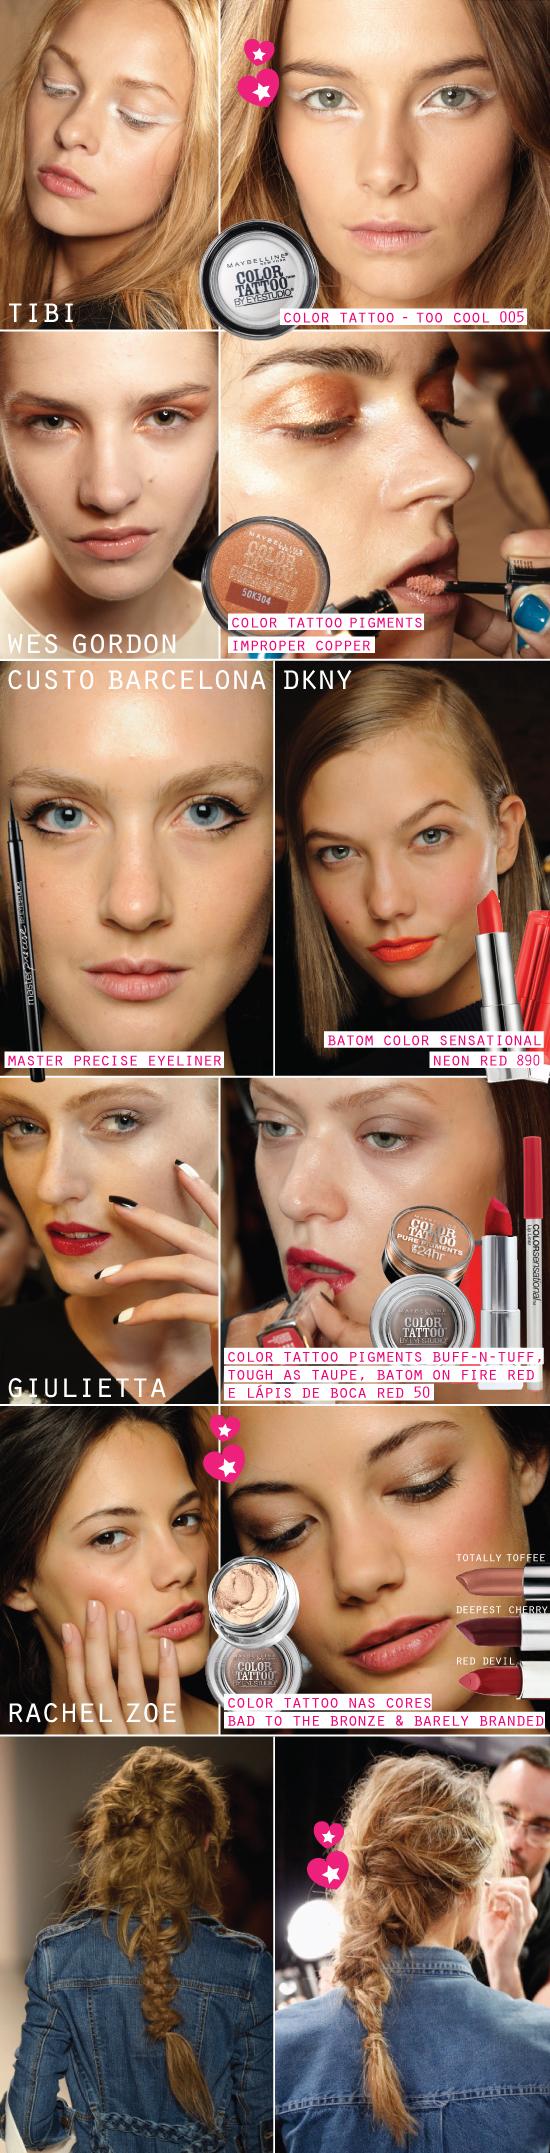 maybelline-nyfw-ny-beleza-maquiagem-make-batom-wes-gordon-rachel-zoe-charlotte-tilbury-giulietta-produtos-dkny-laranja-red-vermelho-makeup-delineador-custo-barcelona-tibi-color-tattoo